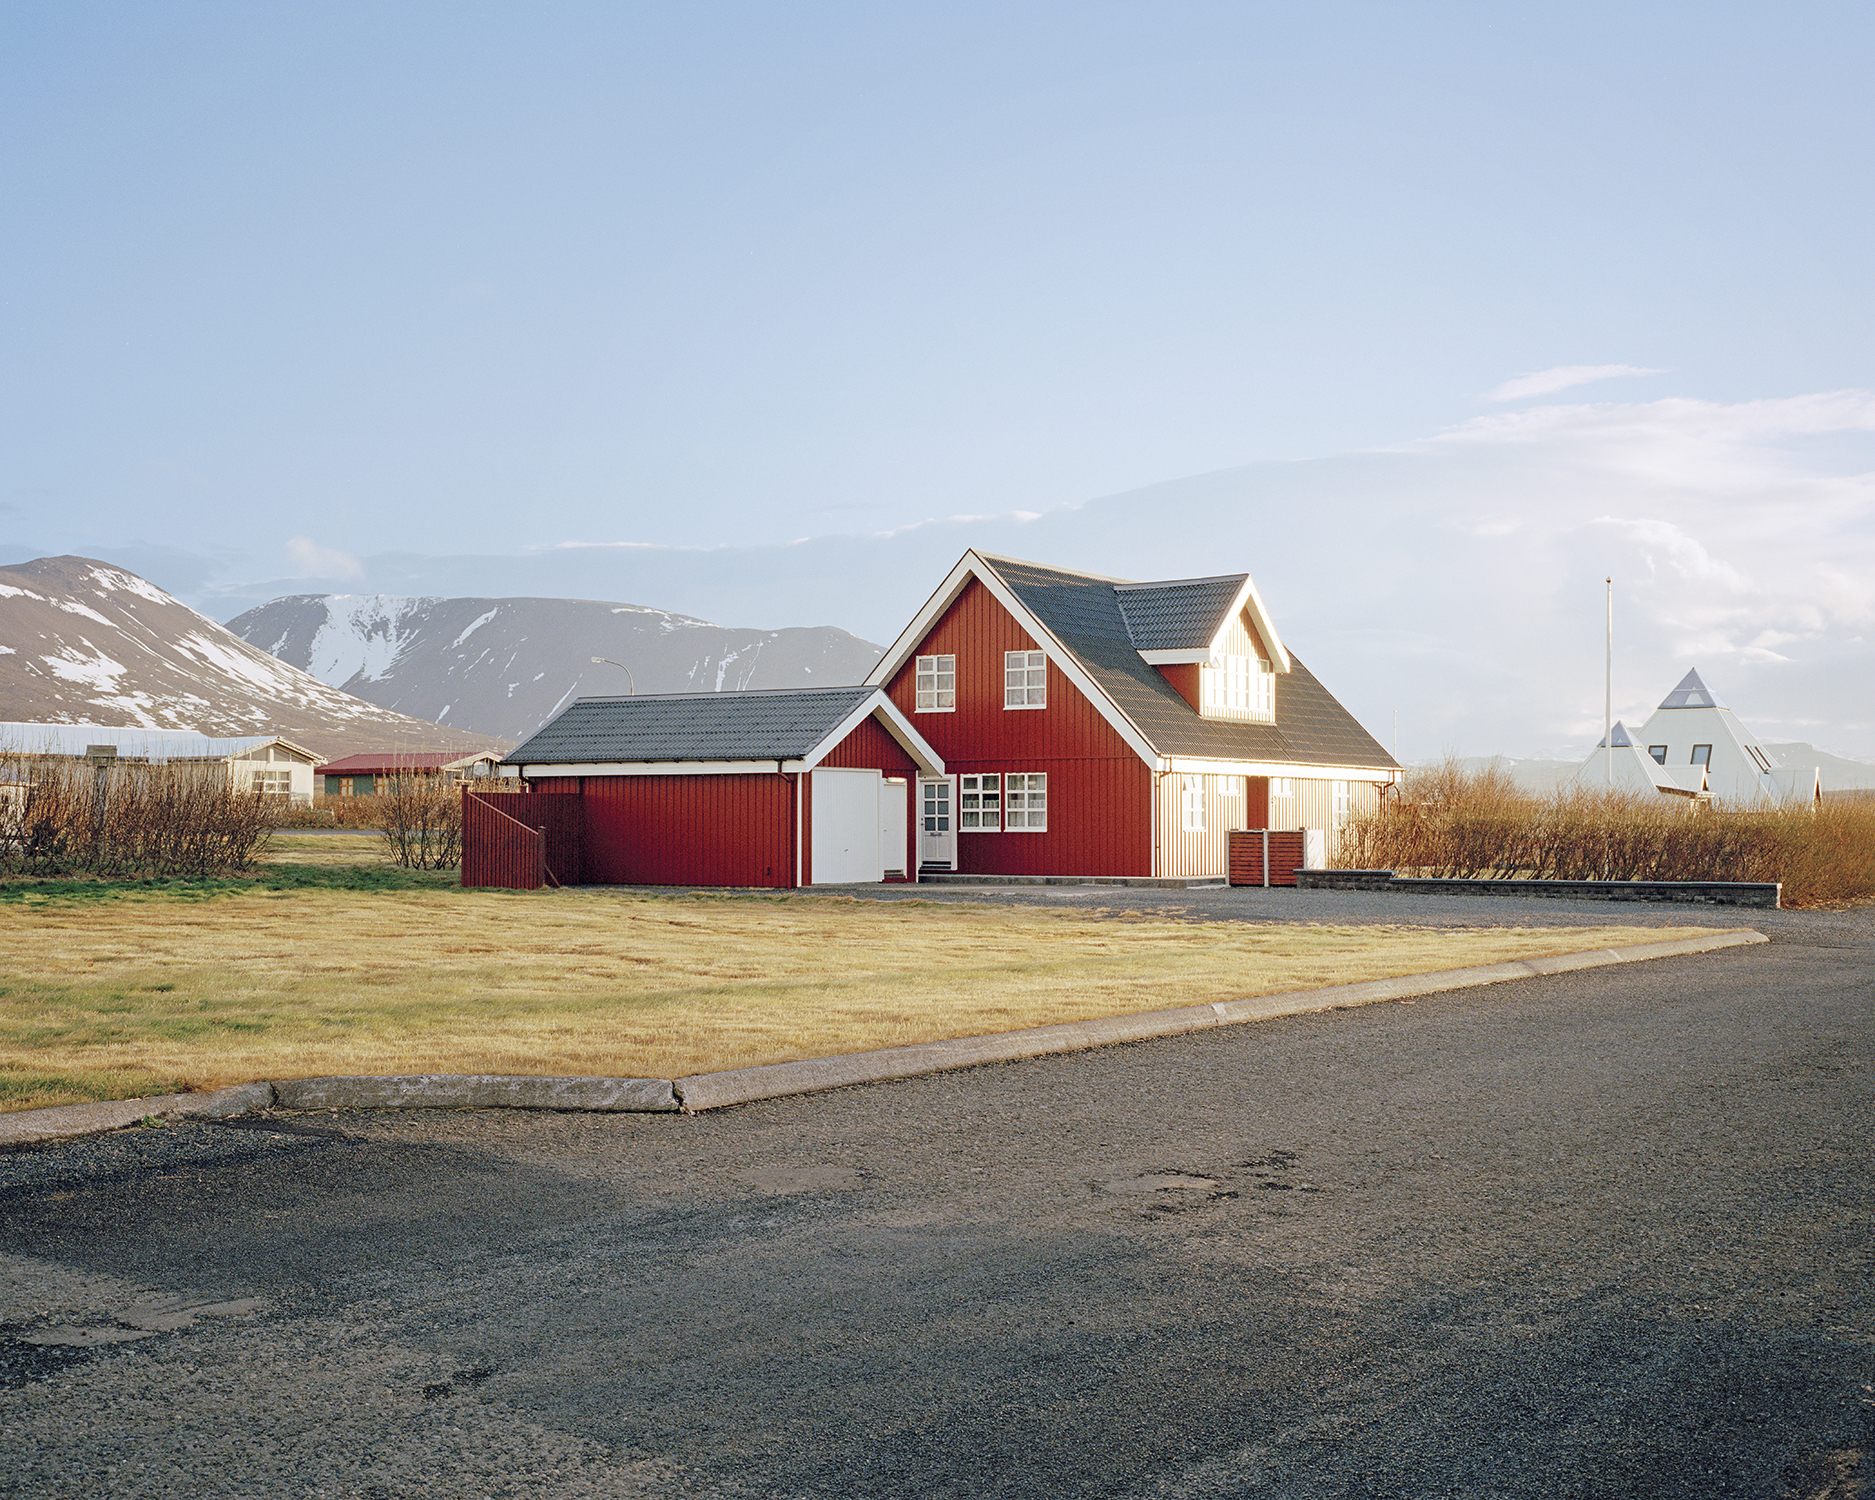 Iceland_001 0362.jpg